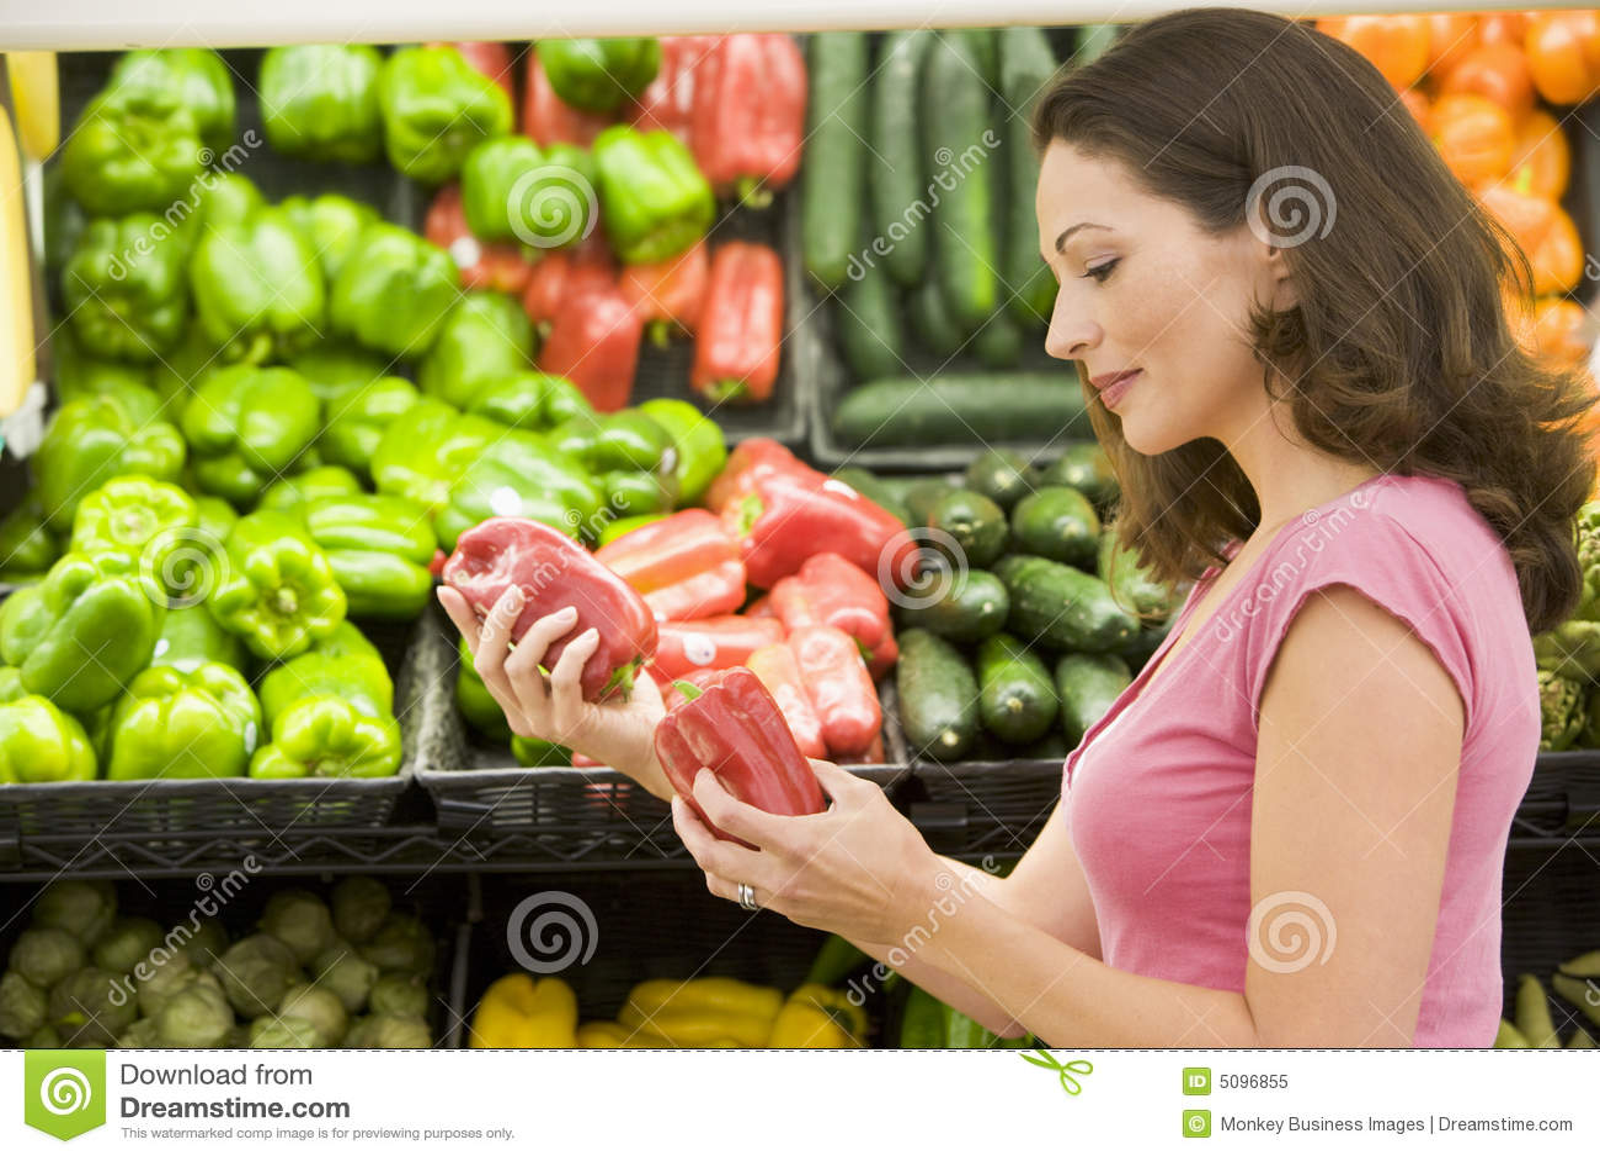 Woman choosing fresh produce